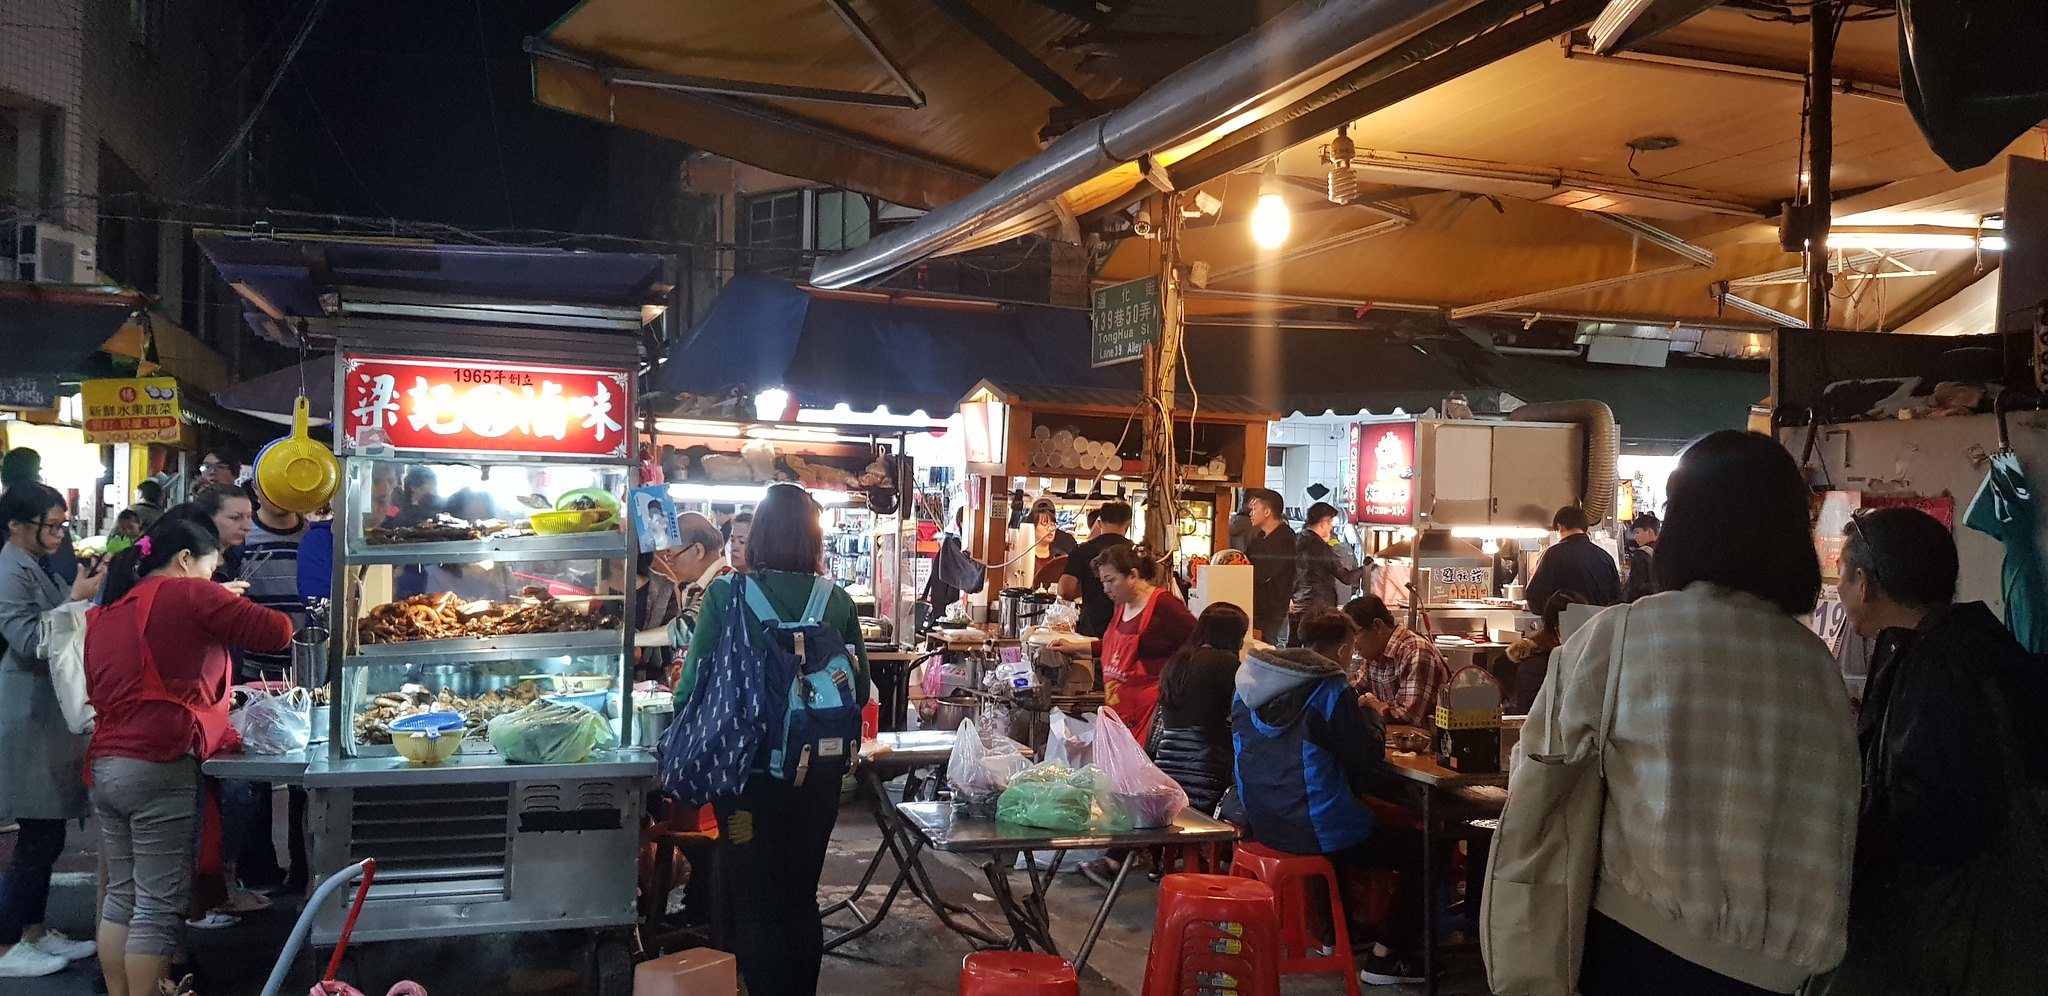 Ninxia street market